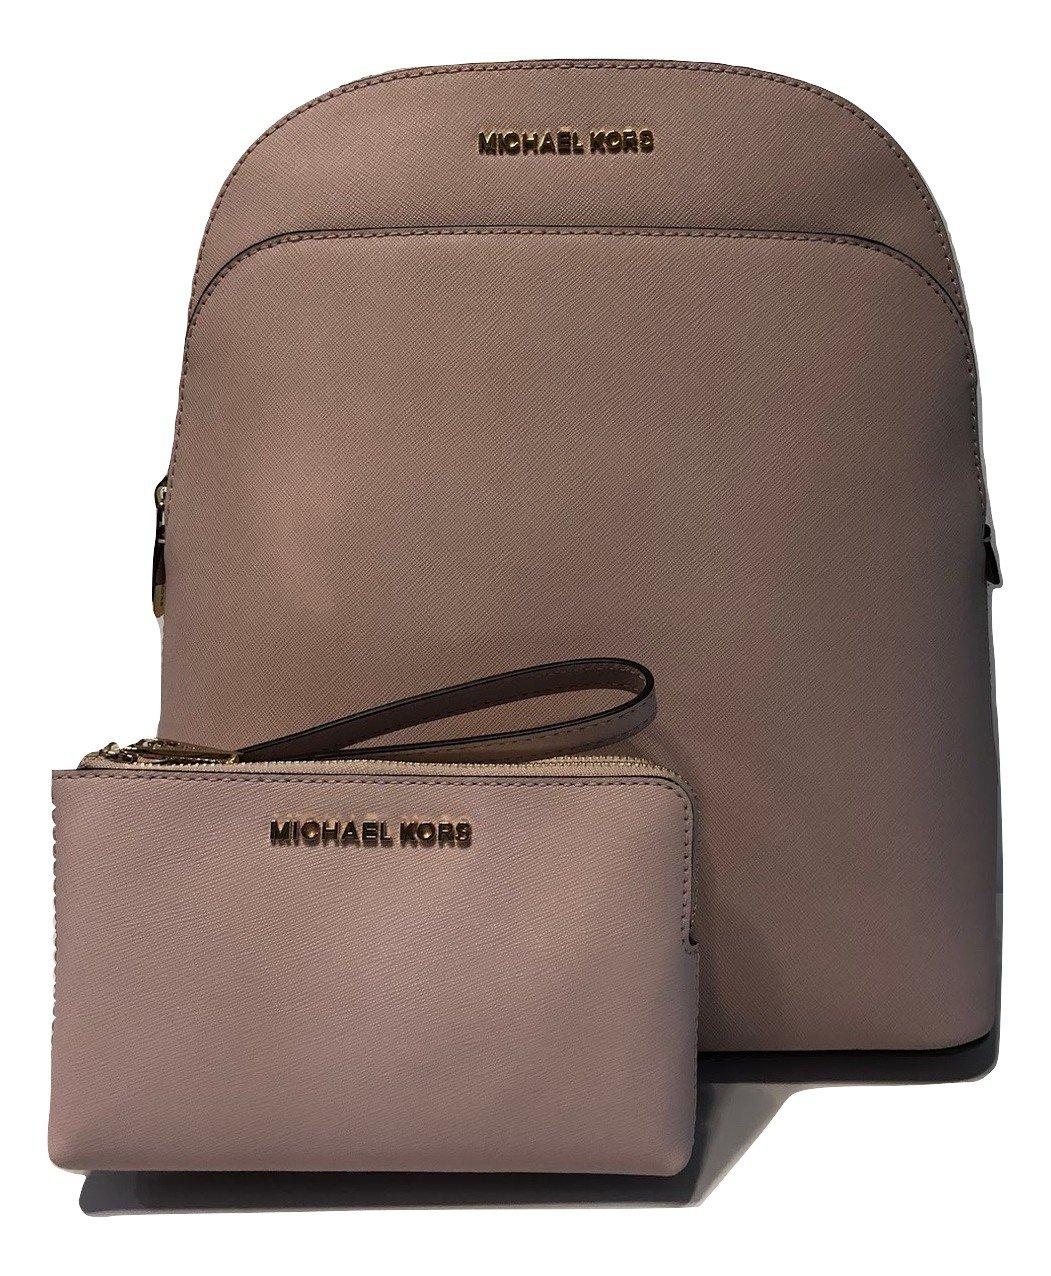 MICHAEL Michael Kors Emmy Large Backpack bundled with Michael Kors Jet Set Travel Double Zip Wallet Wristlet (Blossom)